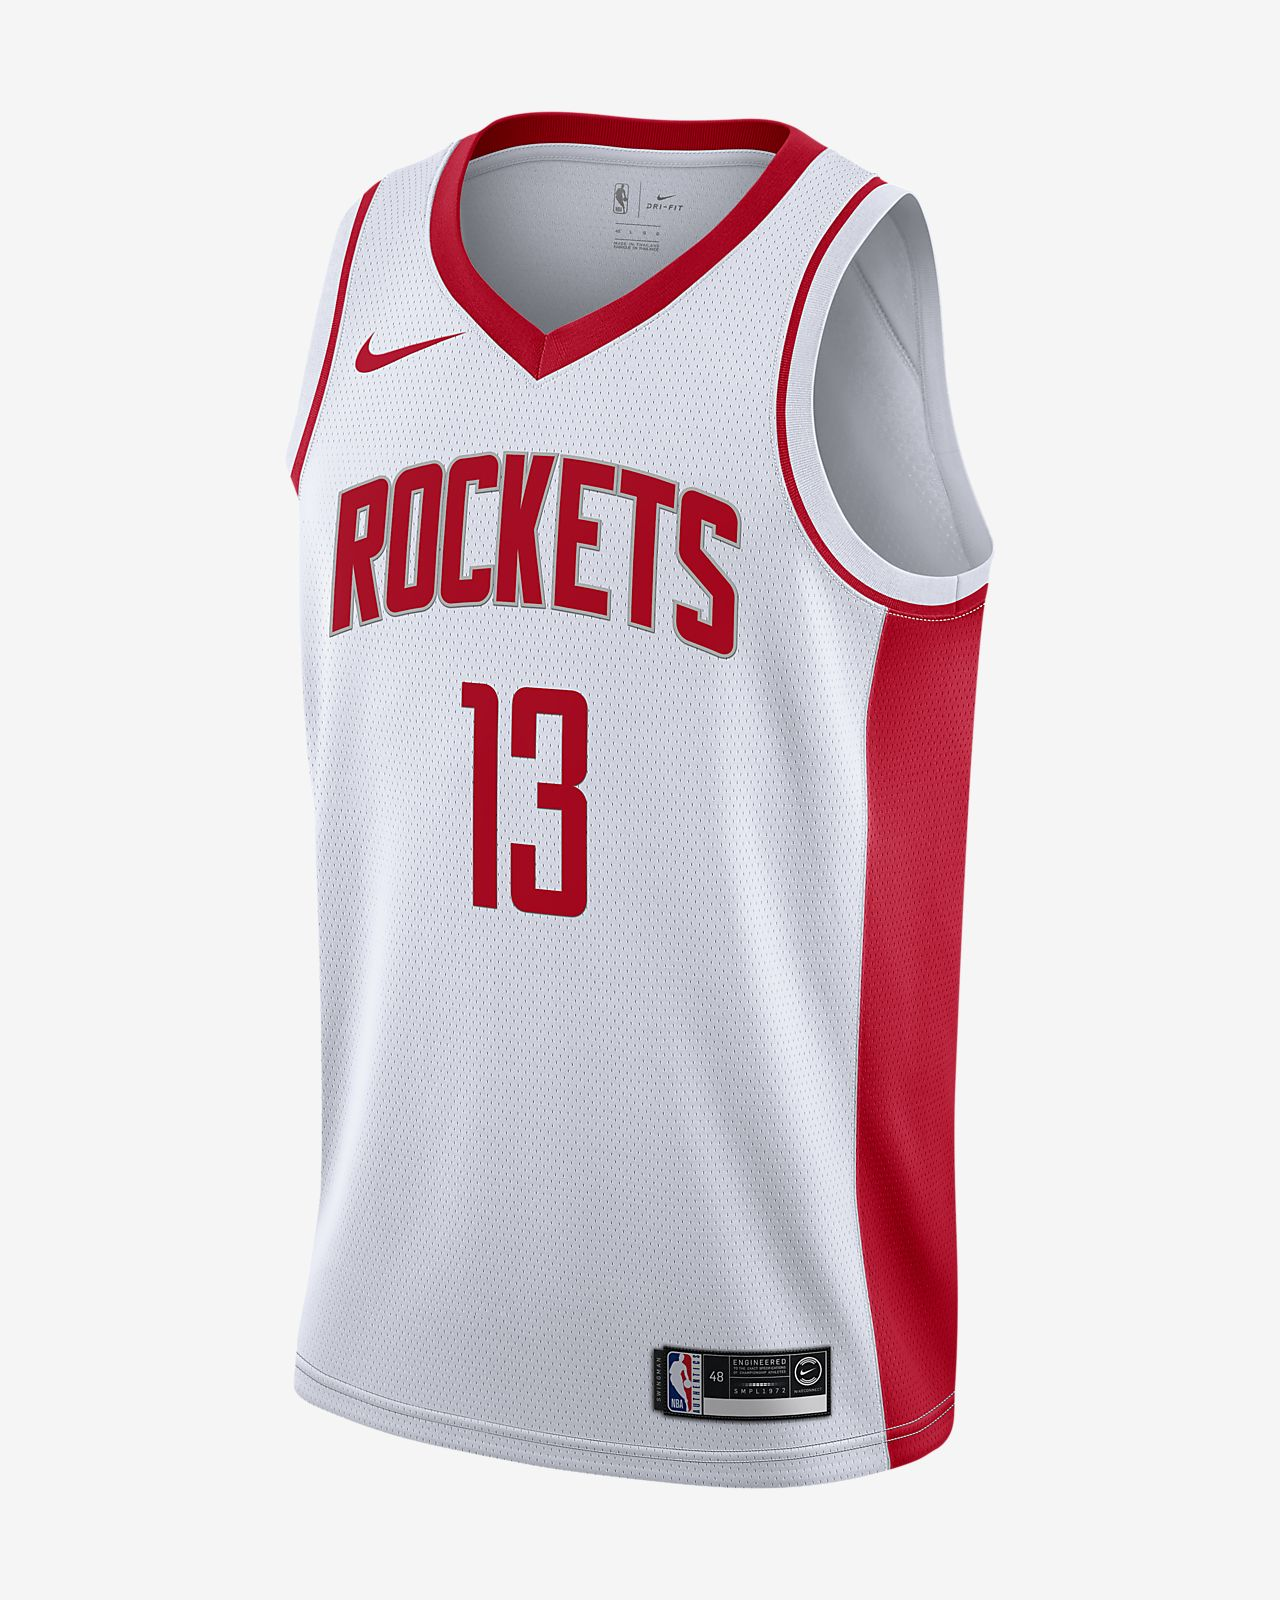 Koszulka Nike NBA Swingman James Harden Rockets Association Edition